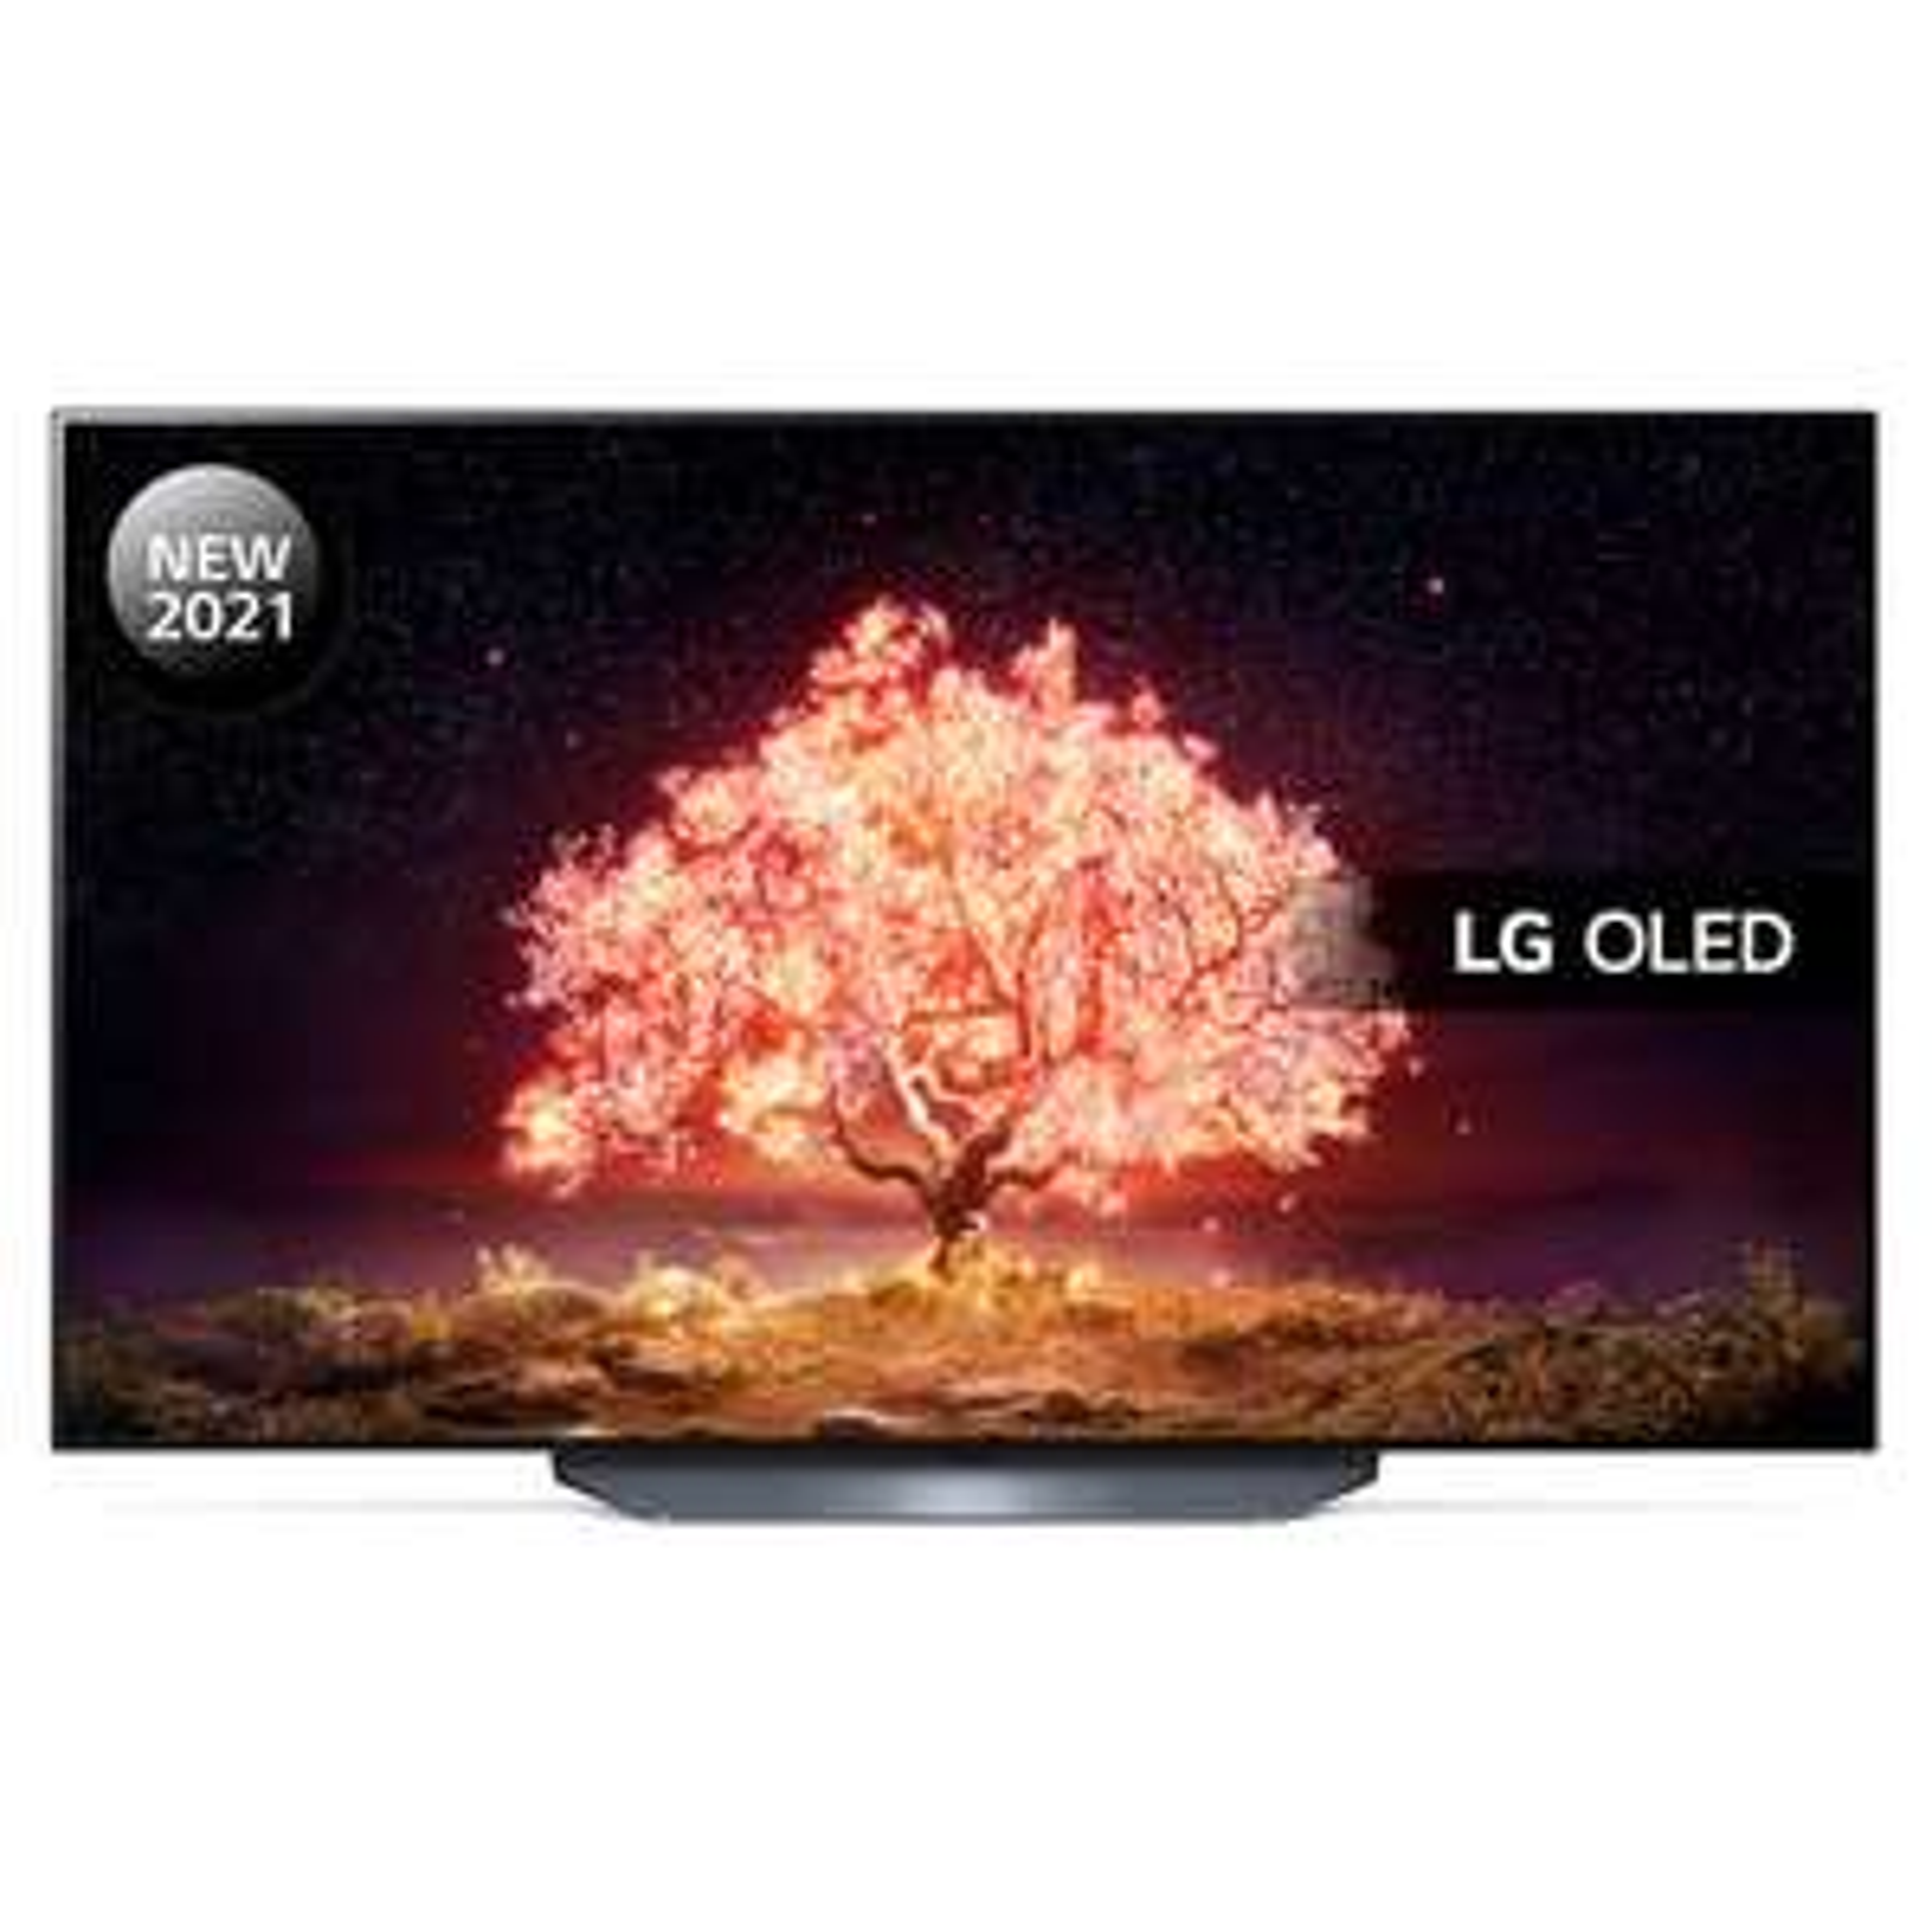 LG OLED55B16LA (2021) OLED HDR 4K Ultra HD Smart TV, Free HBSFA4 TONE wireless Earbuds £50 Deliveroo Voucher - £1169 @ Hughes